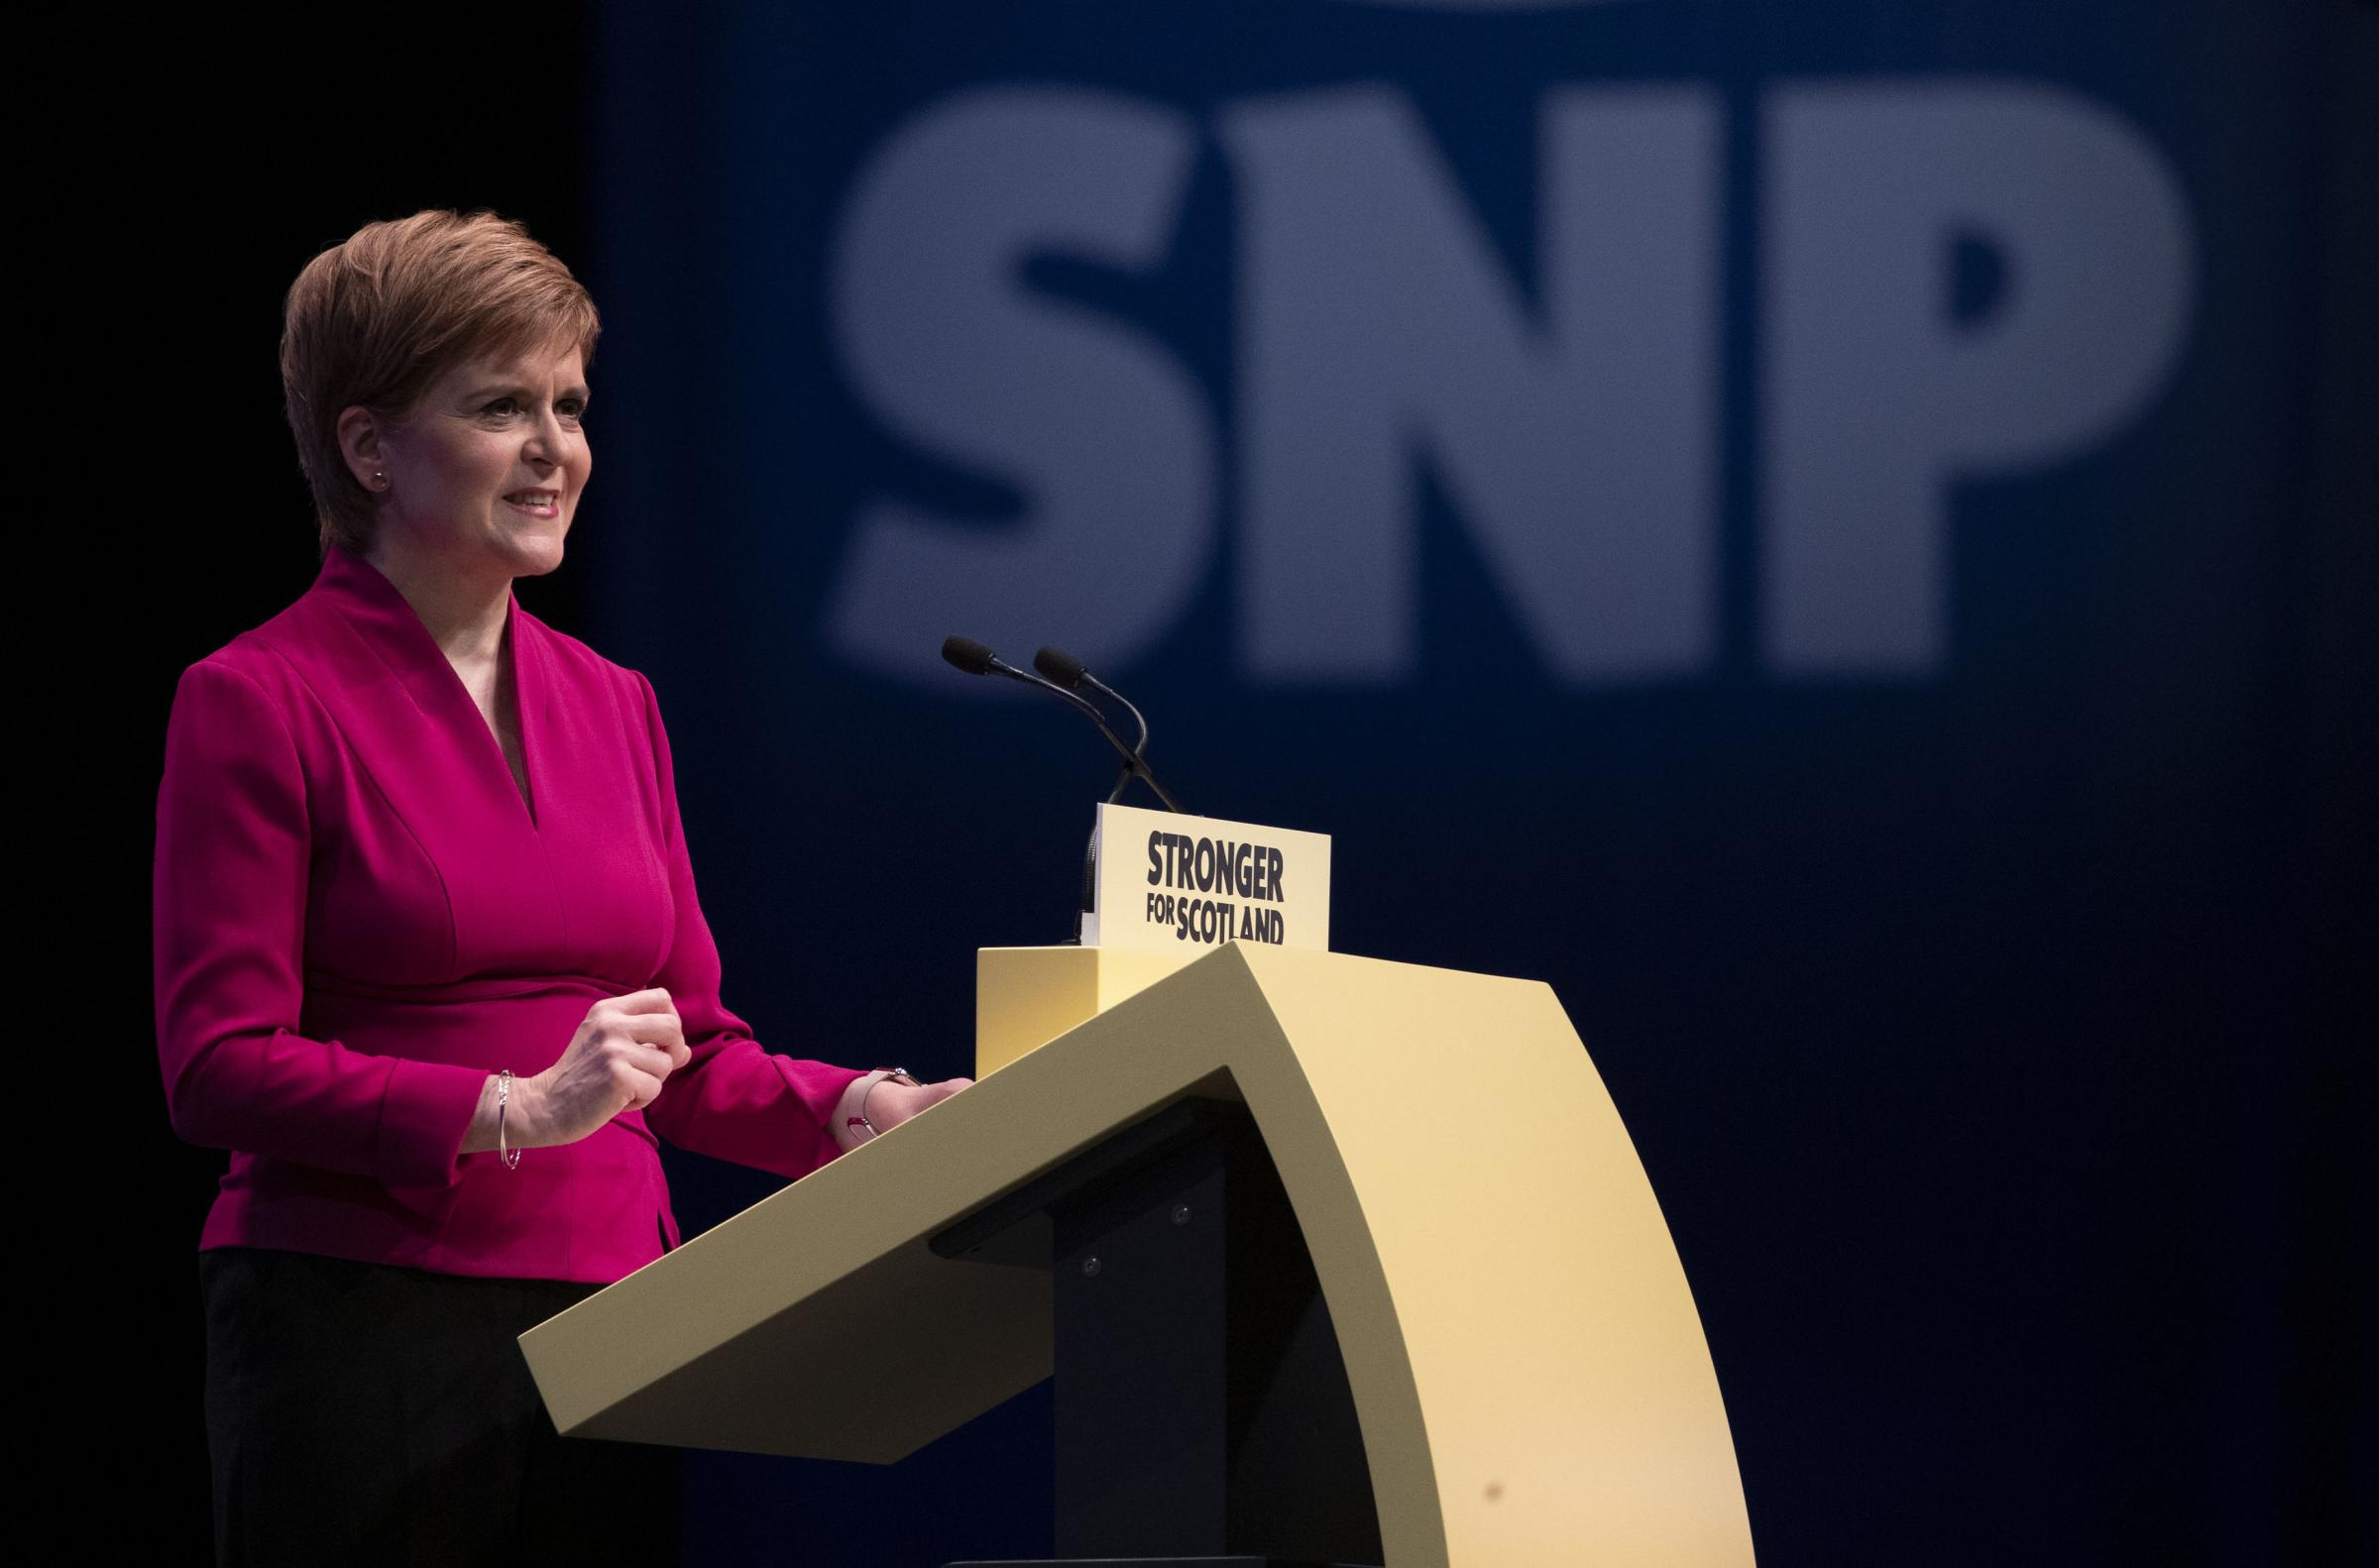 Nicola Sturgeon tops Scottish survey on UK political leaders